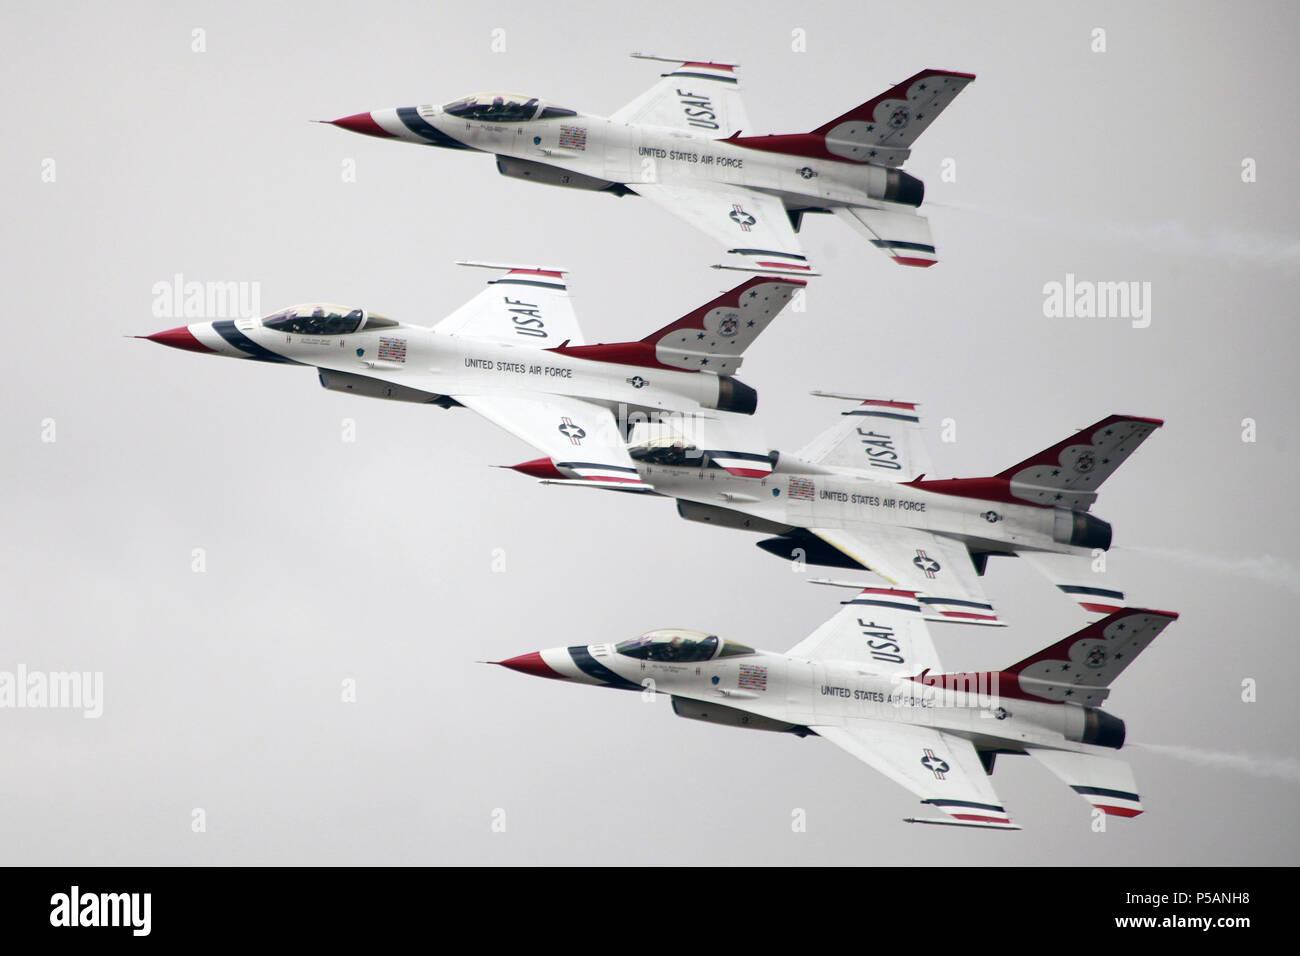 F-16D Falcon. USAF Thunderbirds Display team - Stock Image